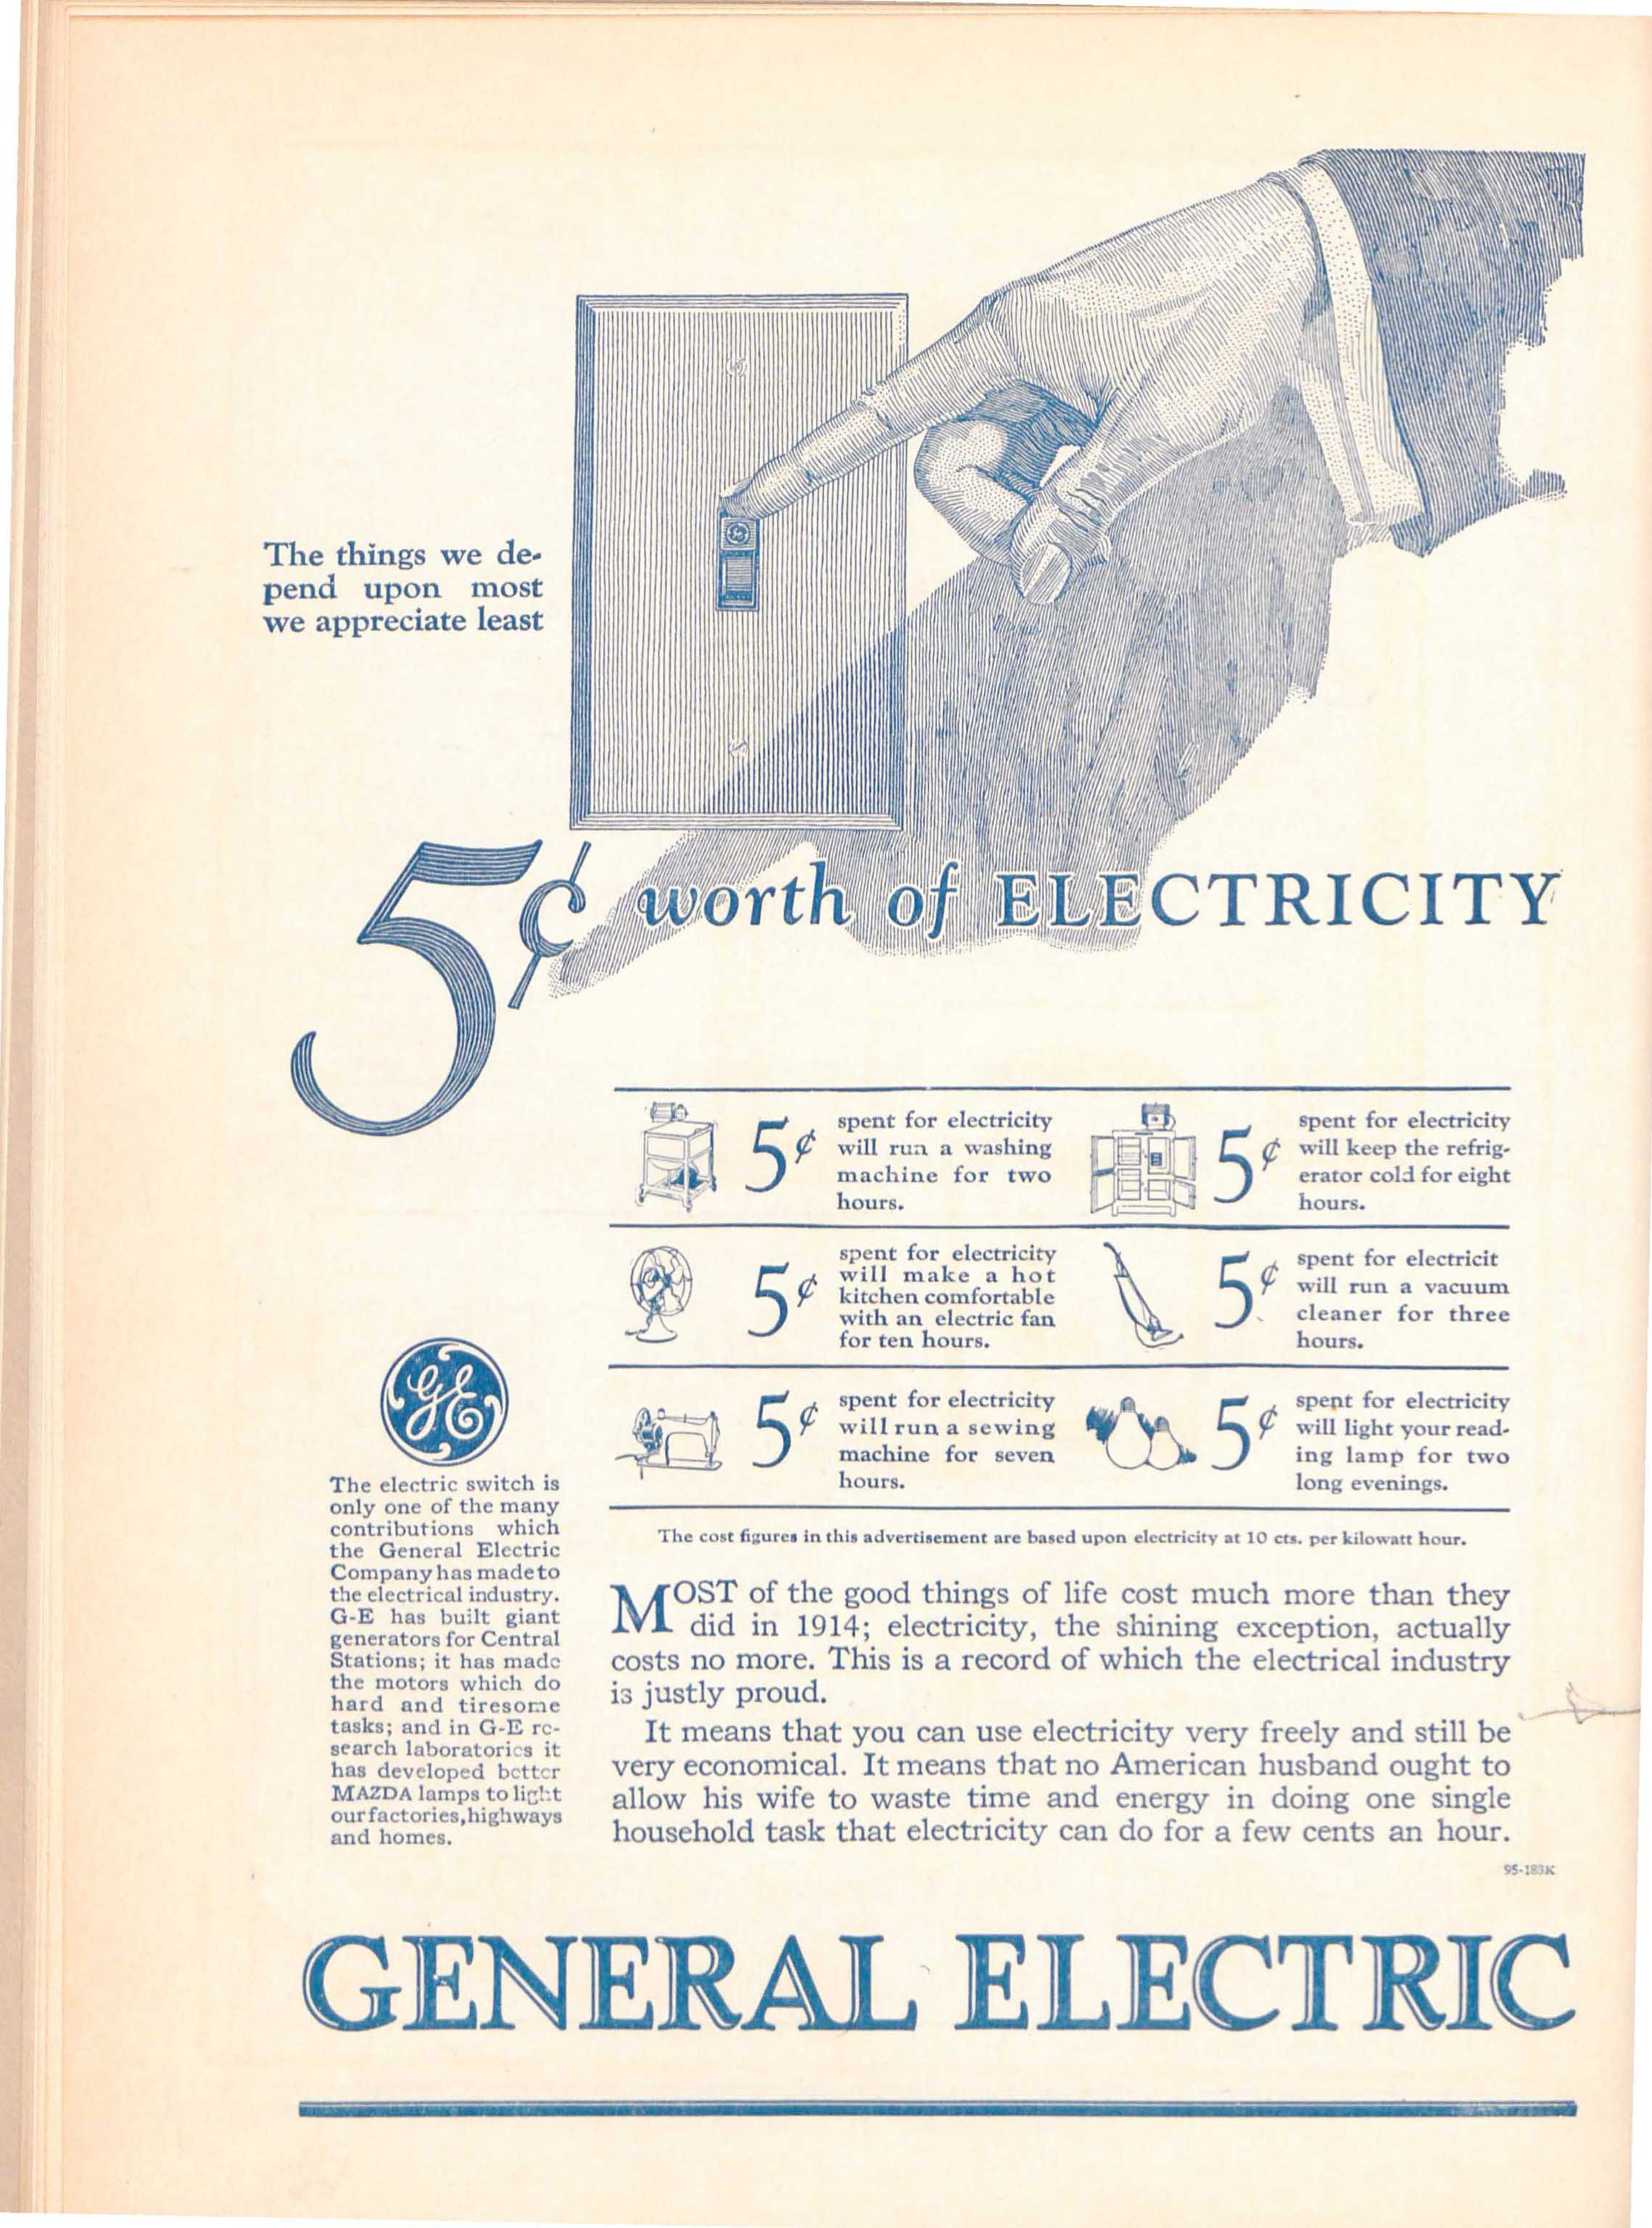 Carolina Alumni Review - June 1926 - page Cover